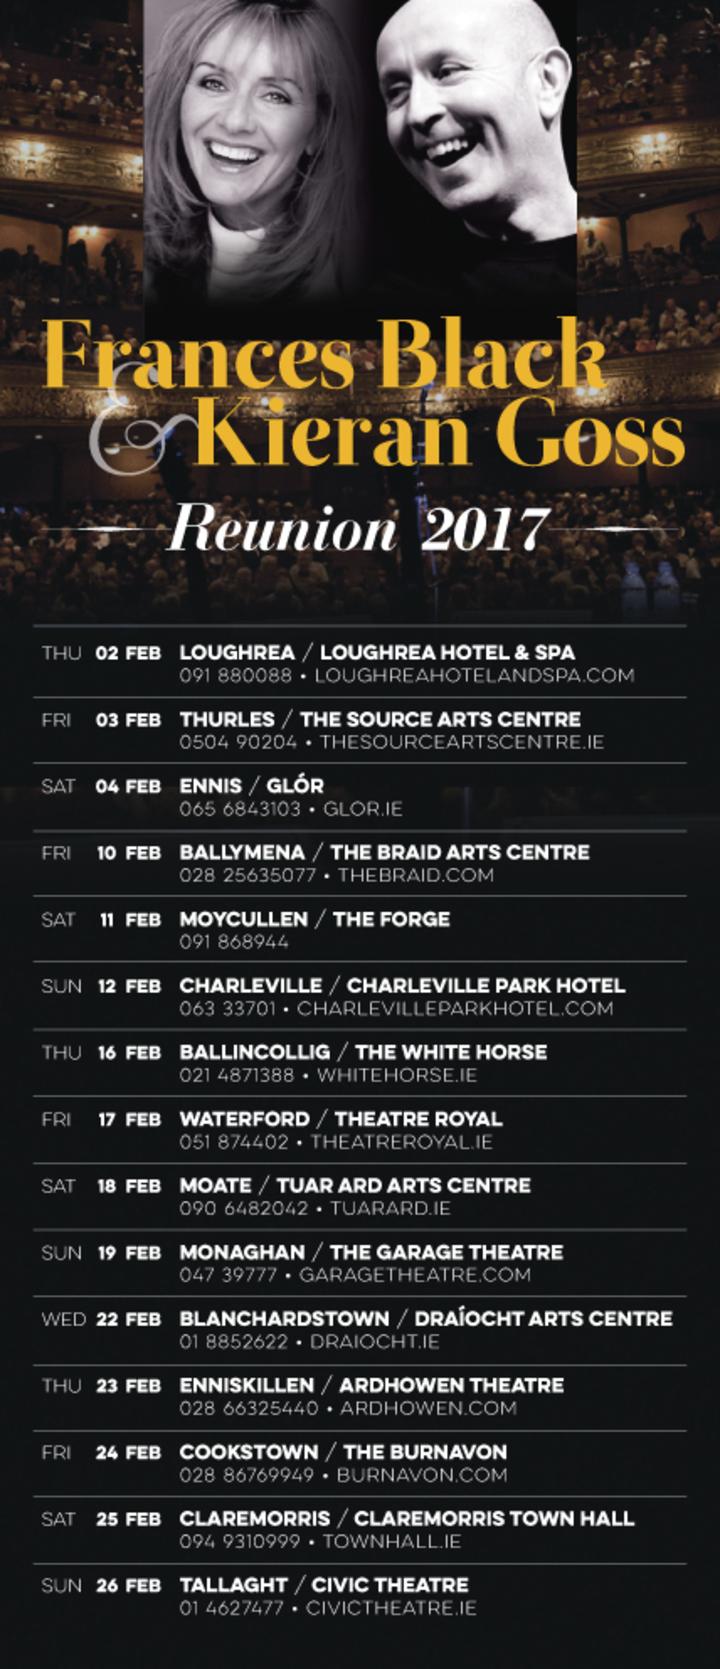 Kieran Goss @ Theatre Royal - Waterford, Ireland